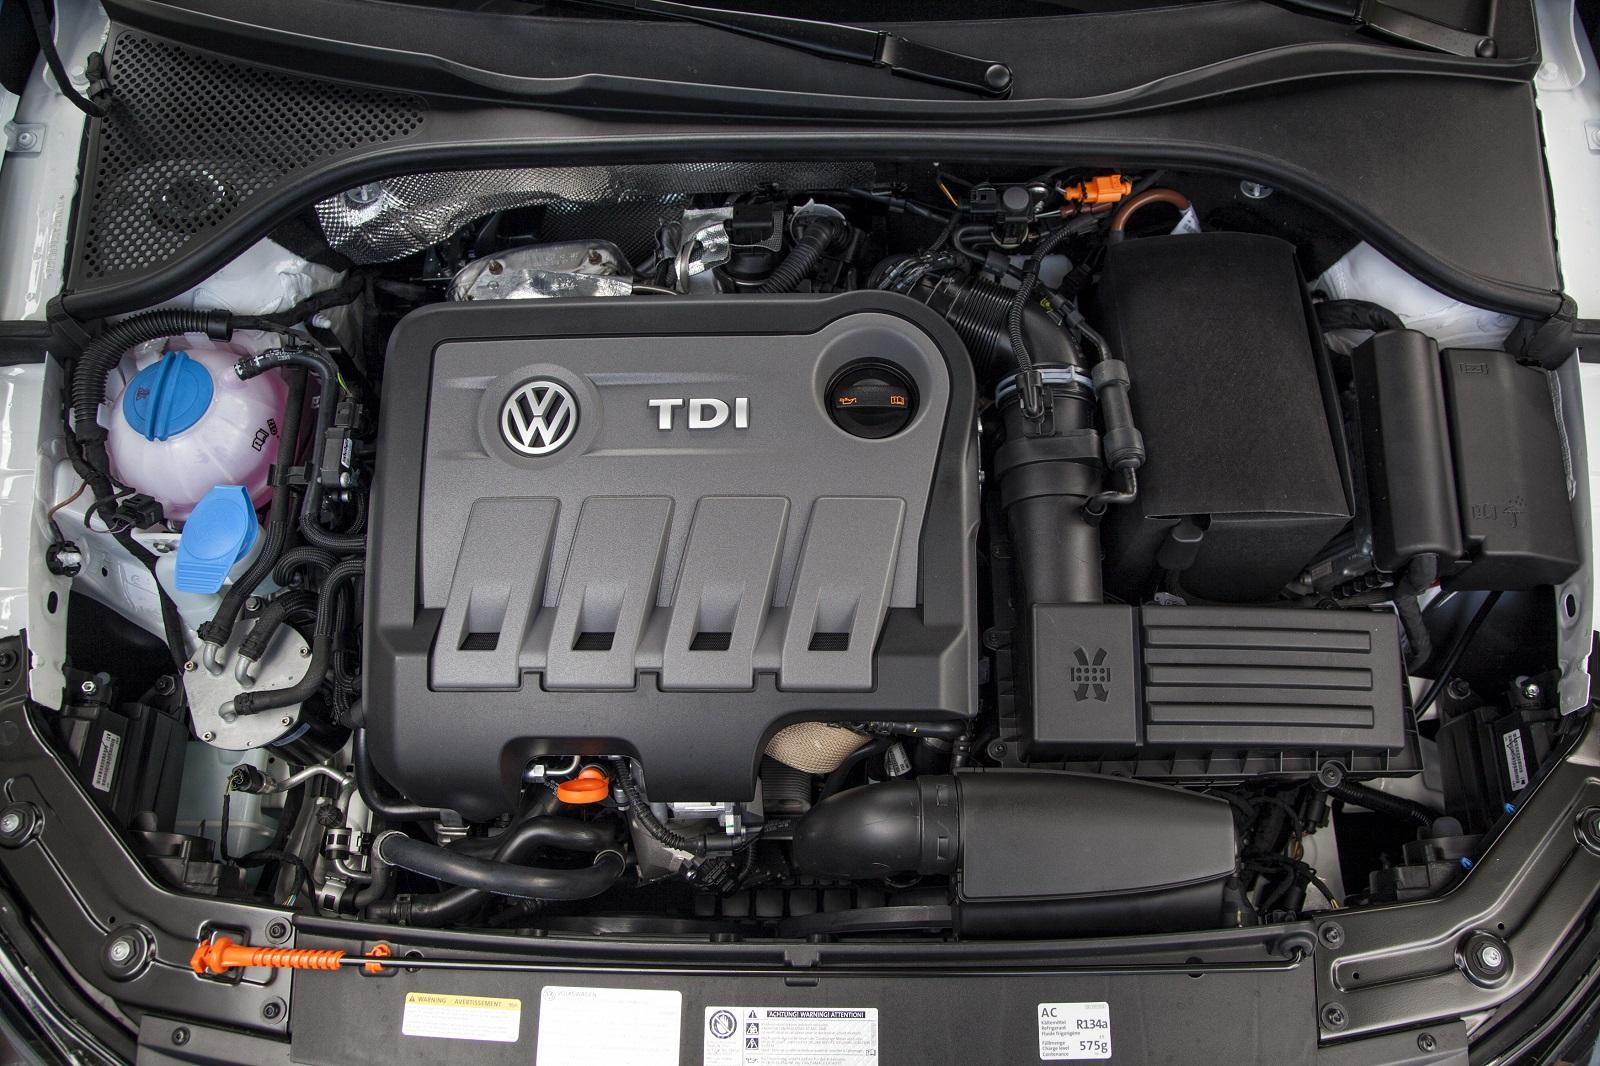 Vw Diesel Truck >> New Investigations Of Bosch, EU Loans In VW Diesel Emission Scandal